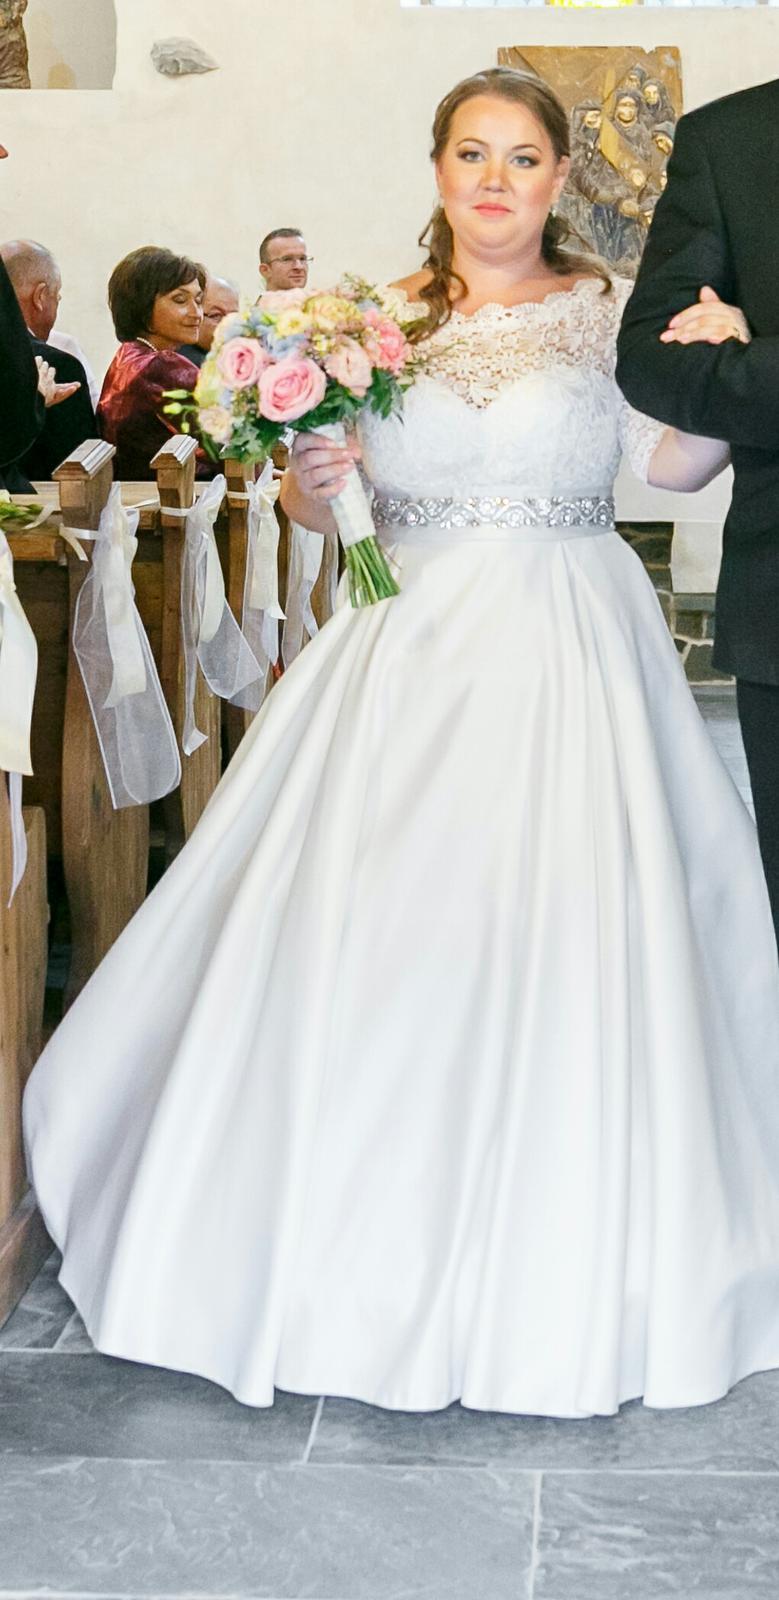 Svadobné šaty pre nízku nevesticku - Obrázok č. 3